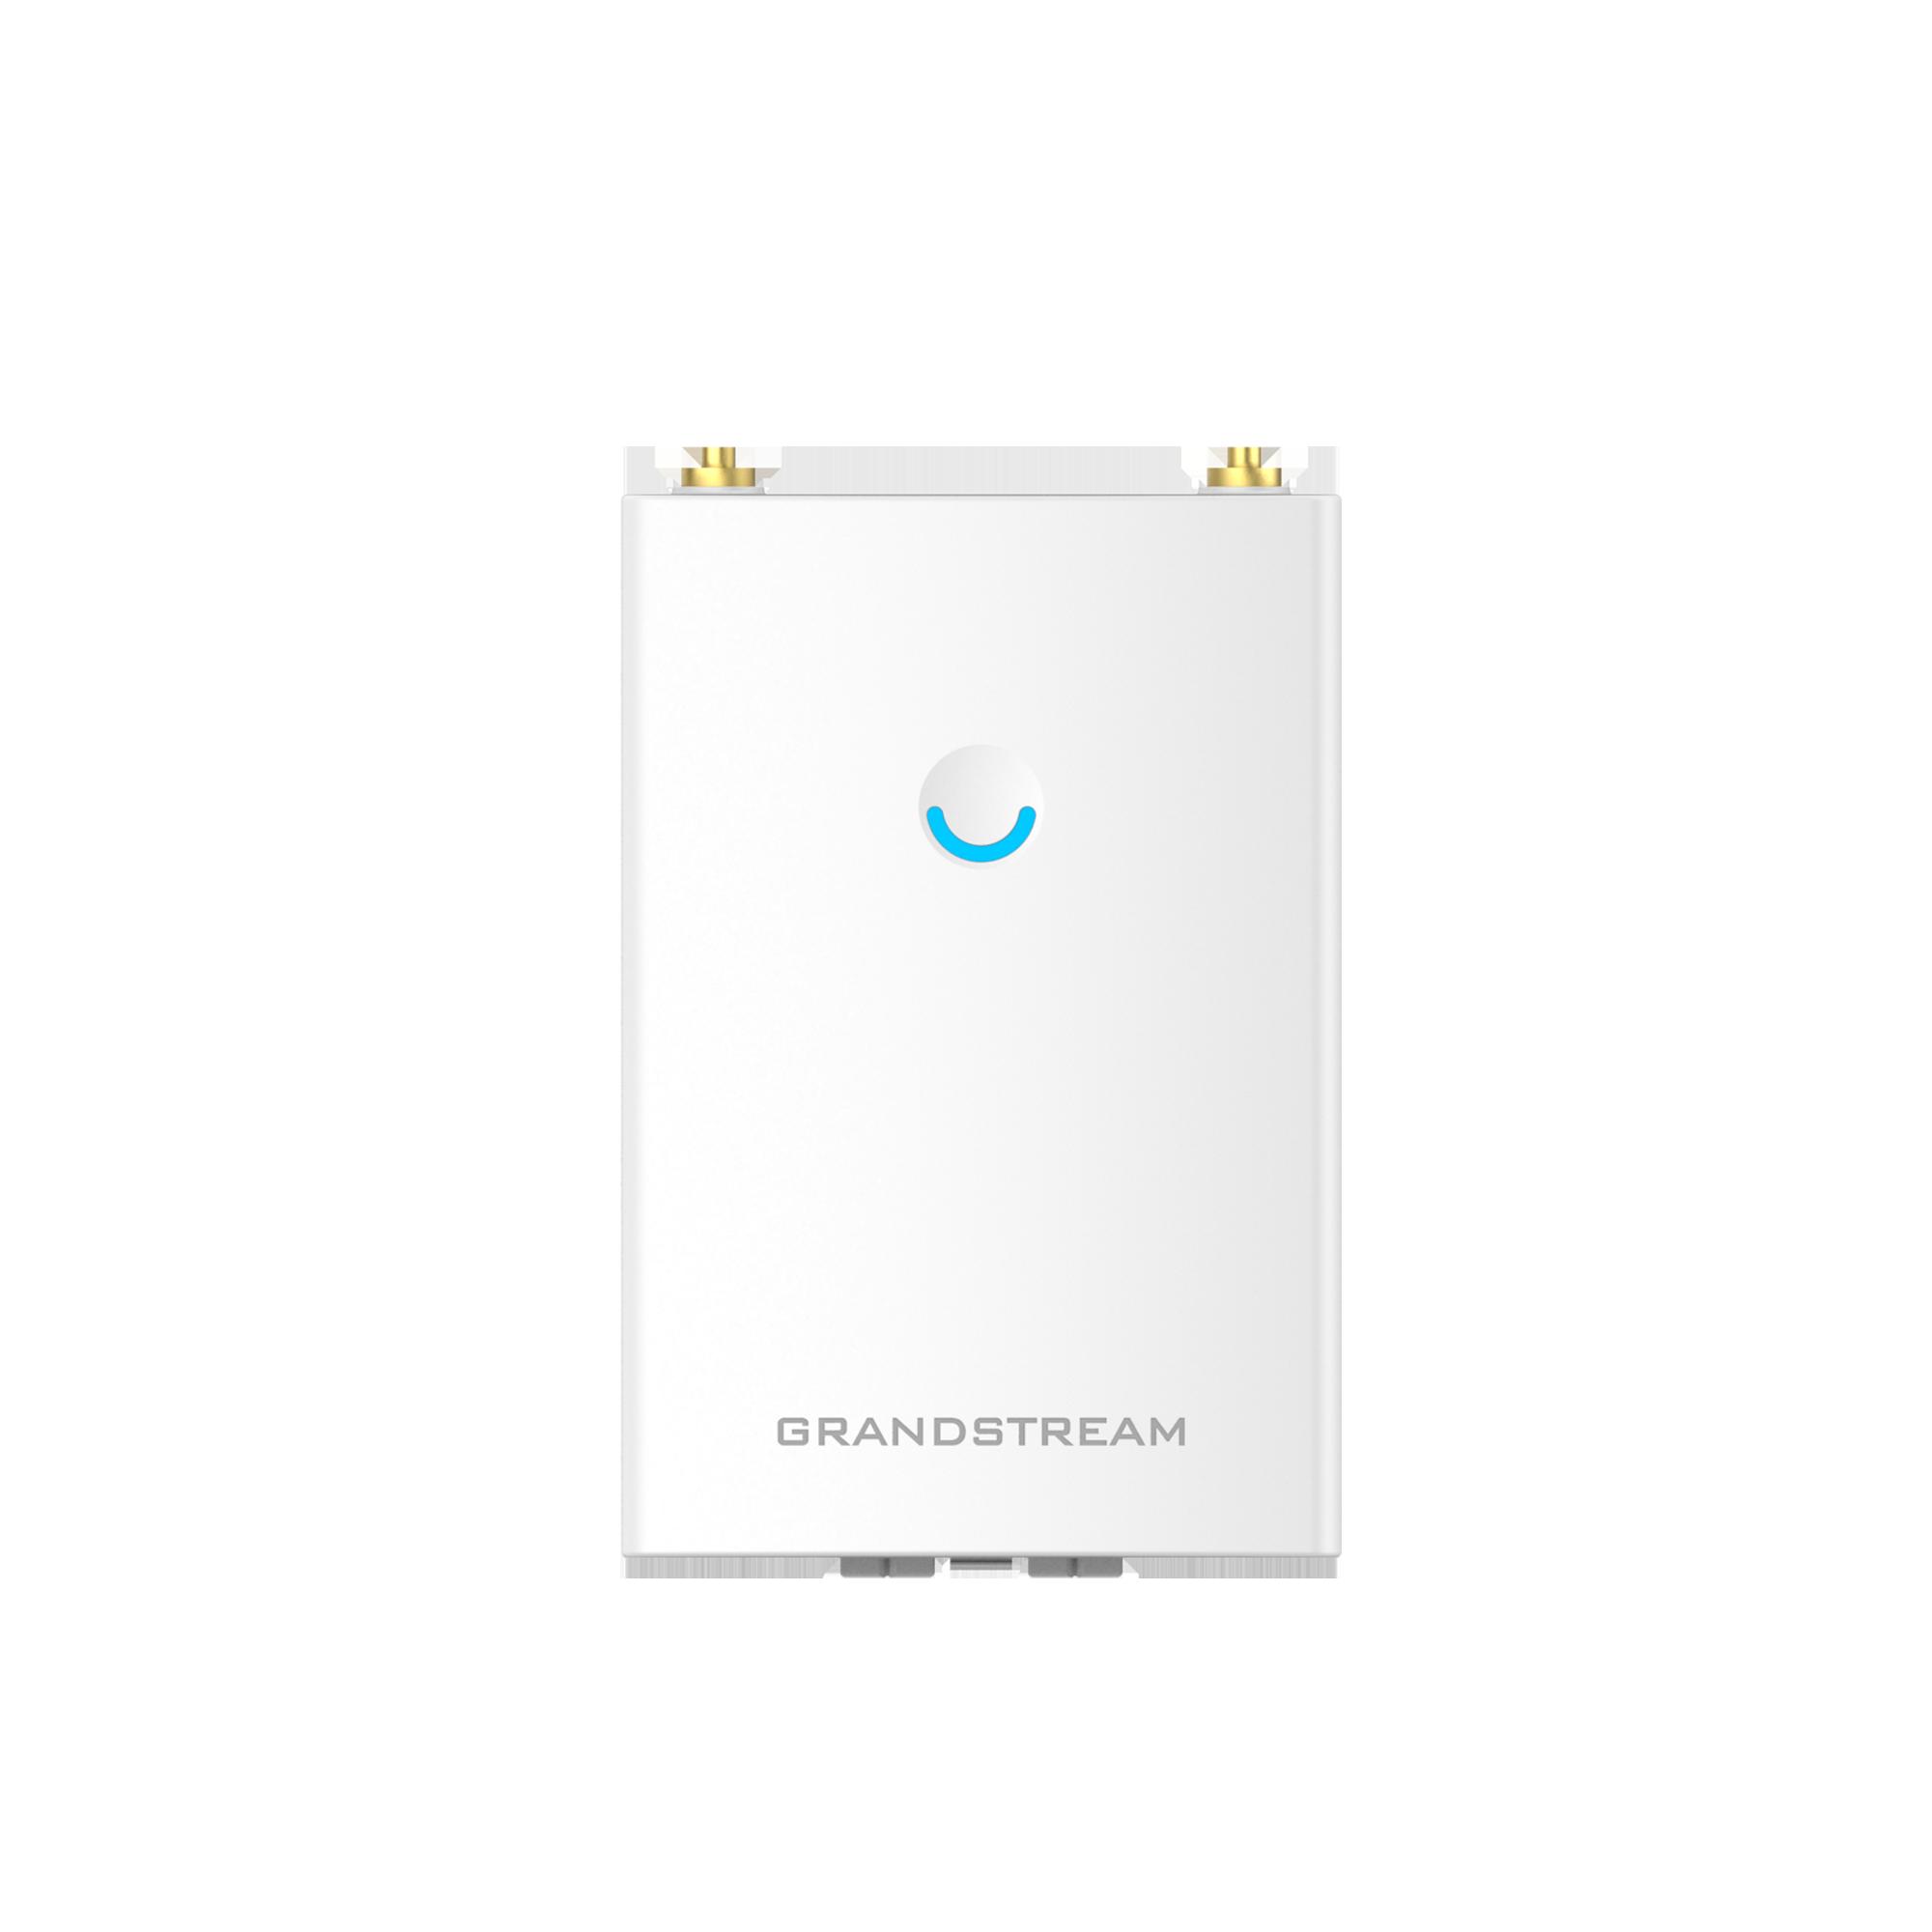 GWN7605LR_no_antenna